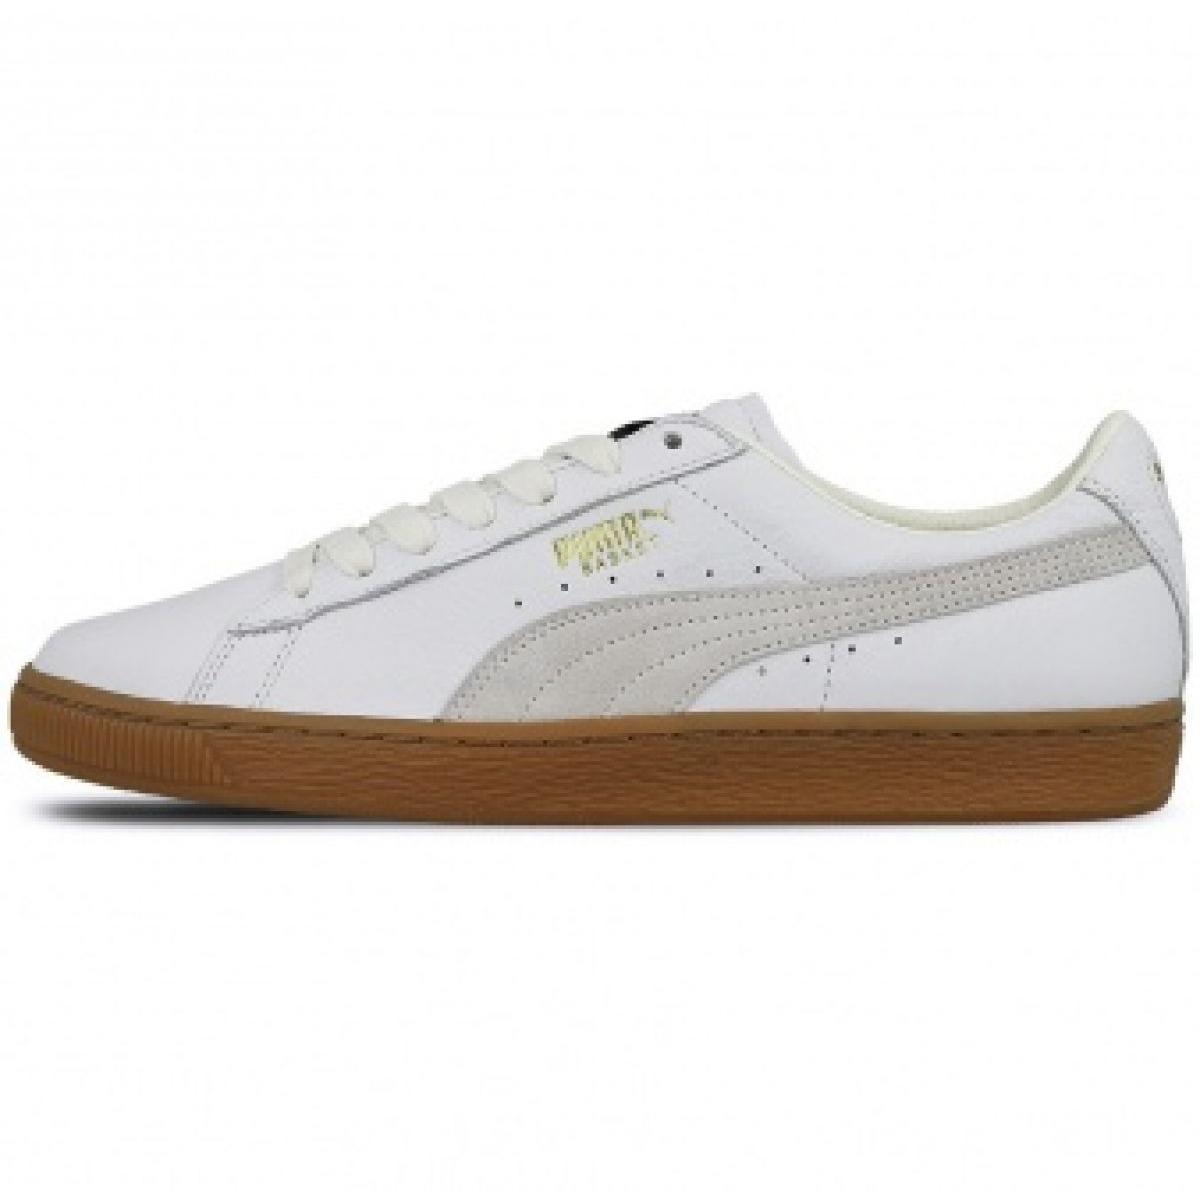 Consistente inundar Pedir prestado  Puma Basket Classic Gum Deluxe M 365366 01 shoes white - ButyModne.pl